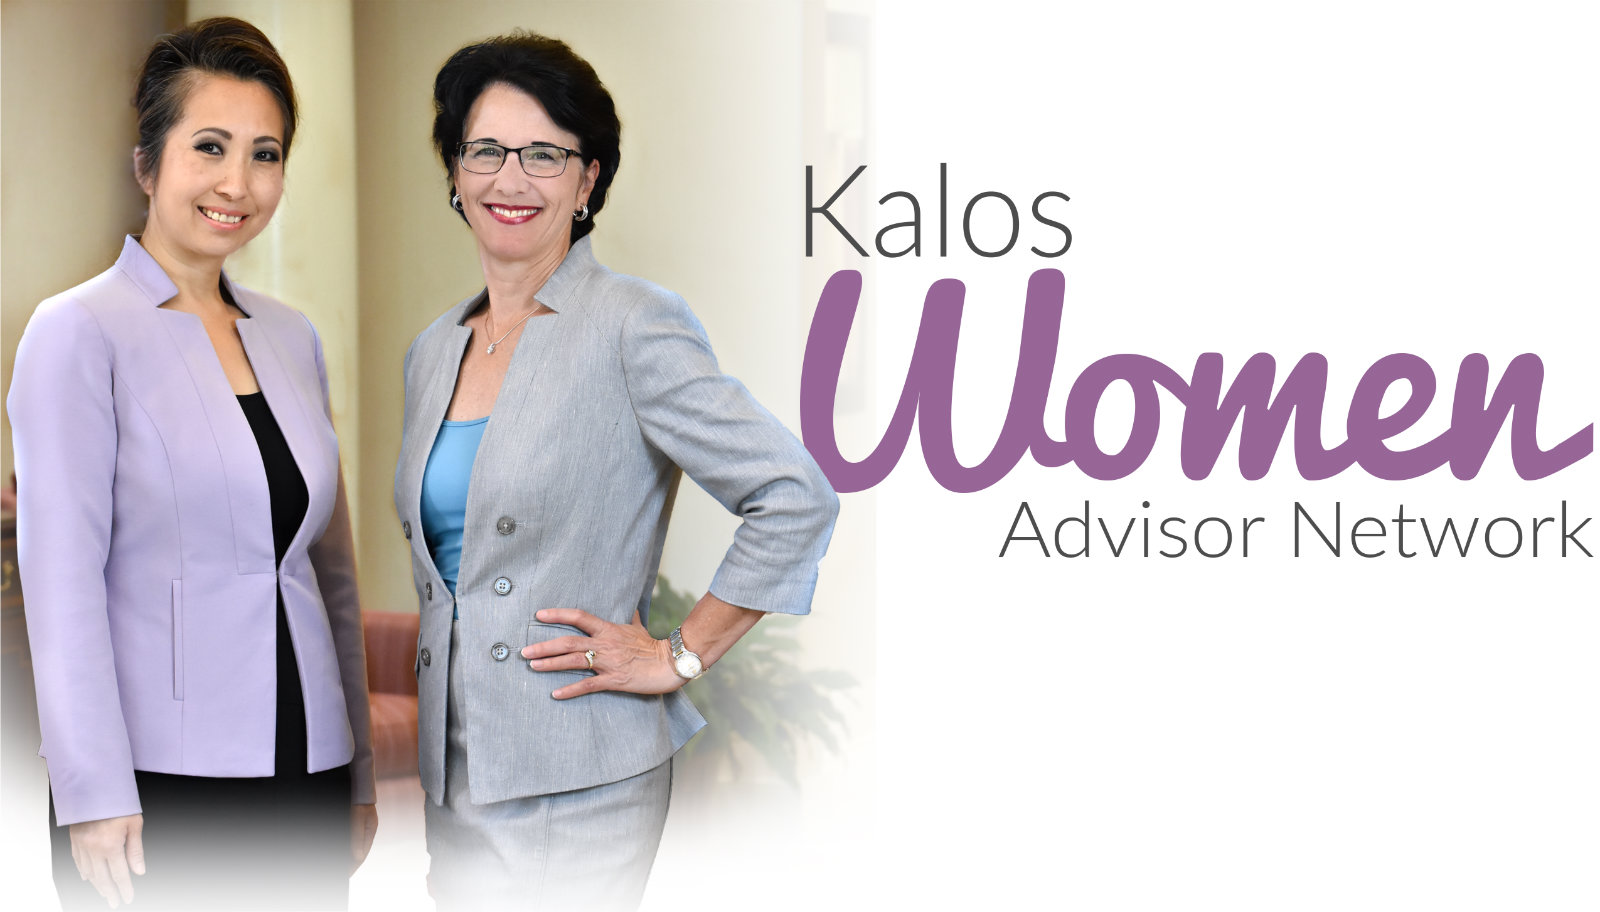 Kalos Financial Atlanta Kalos Women Advisor Network